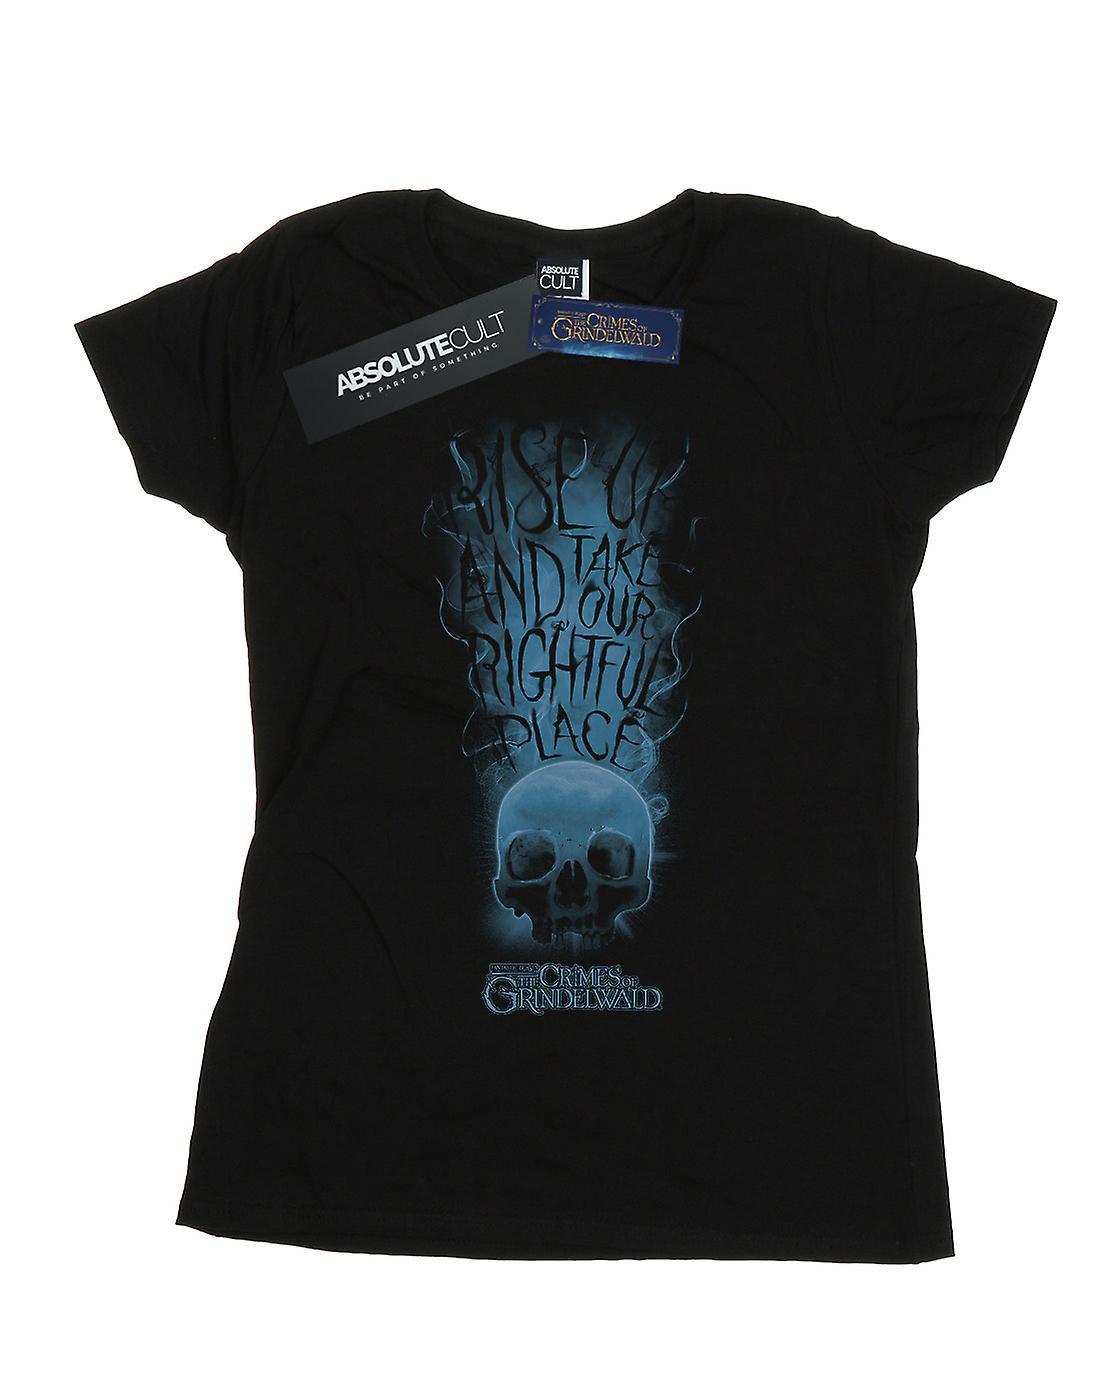 Fantastic Beasts Women's The Crimes Of Grindelwald Skull Smoke T-Shirt